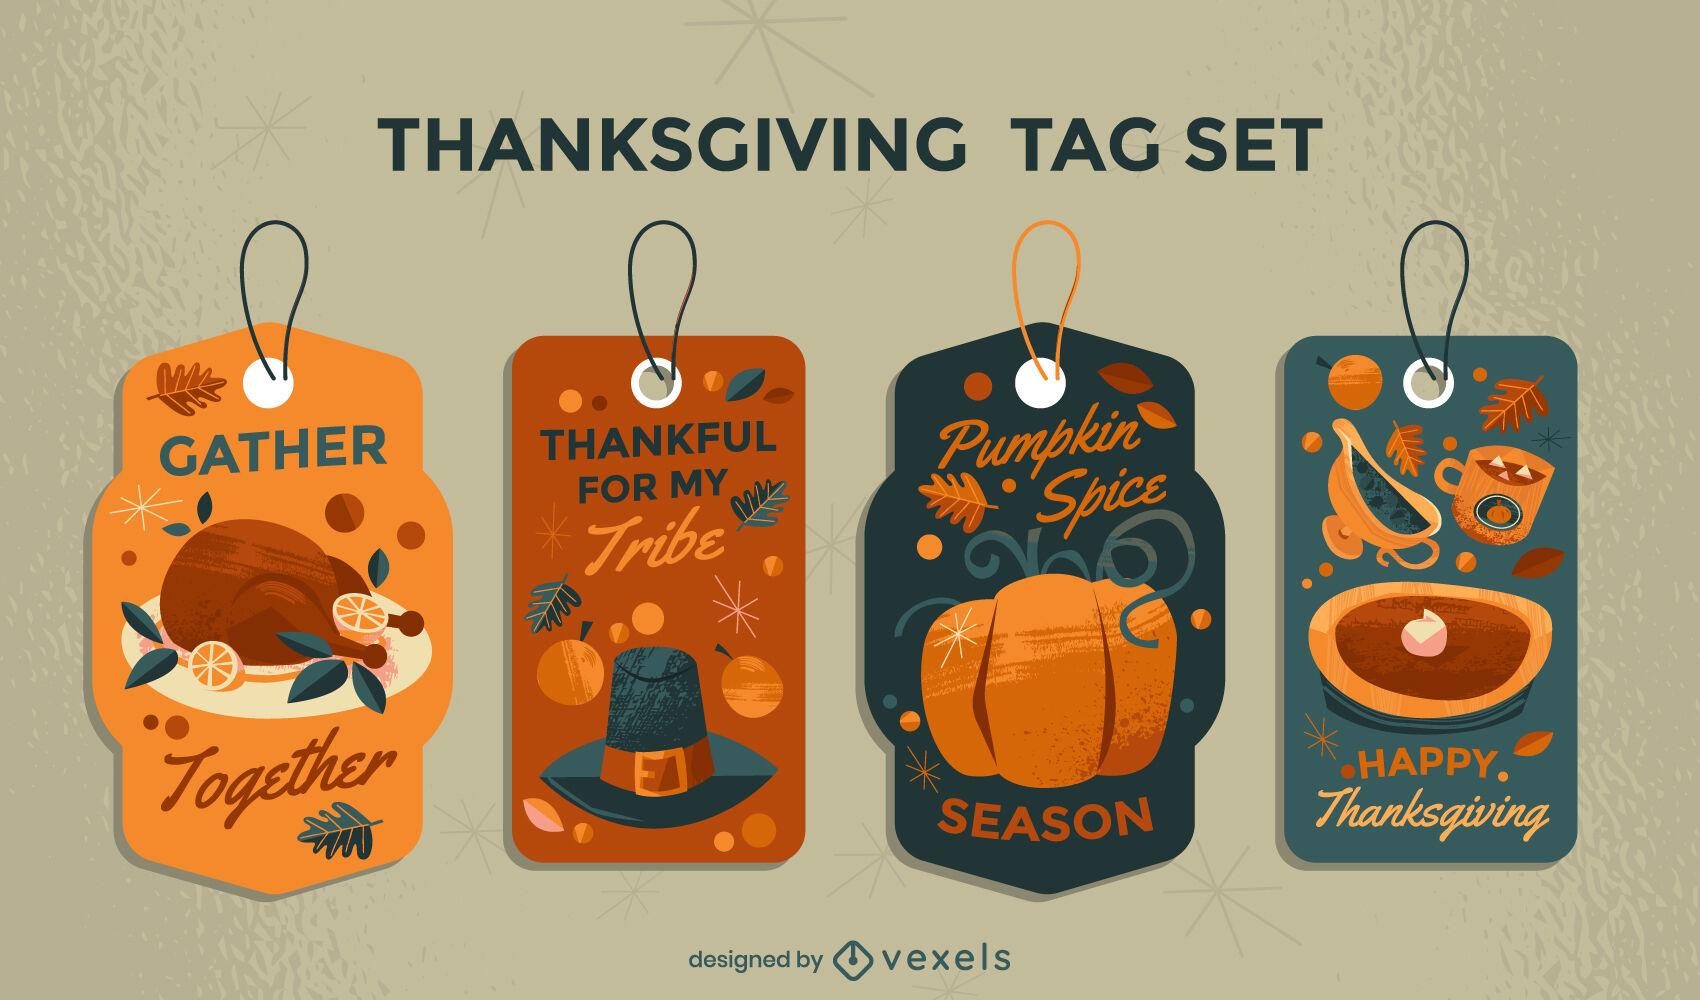 Thanksgiving traditional holiday food tag set